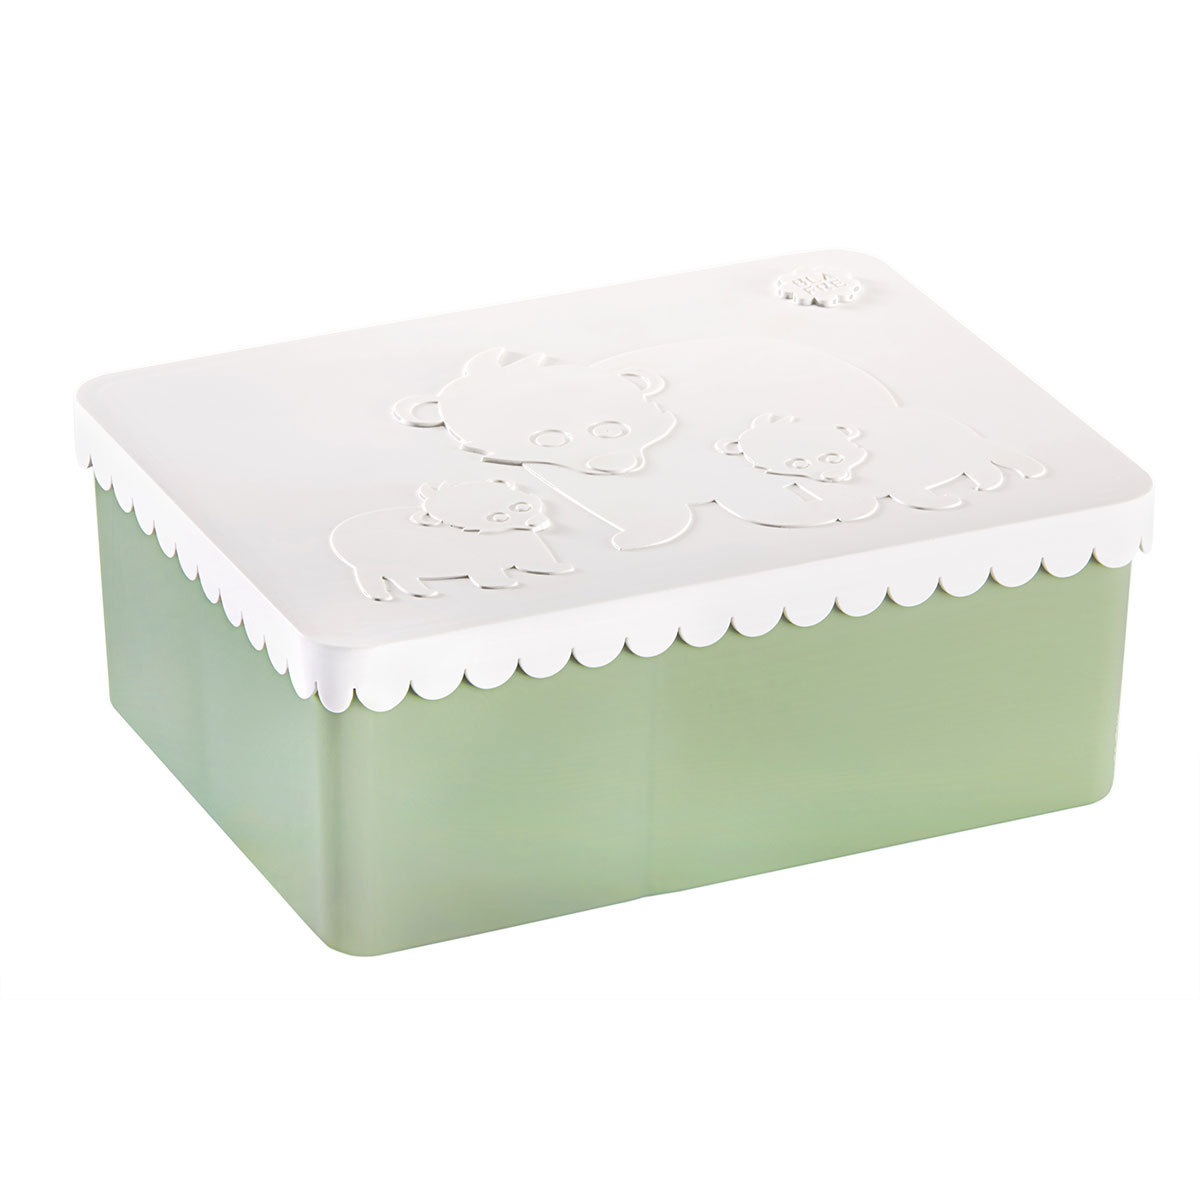 Vaisselle & Couvert LunchBox Polar - Blanc / Vert LunchBox Polar - Blanc / Vert